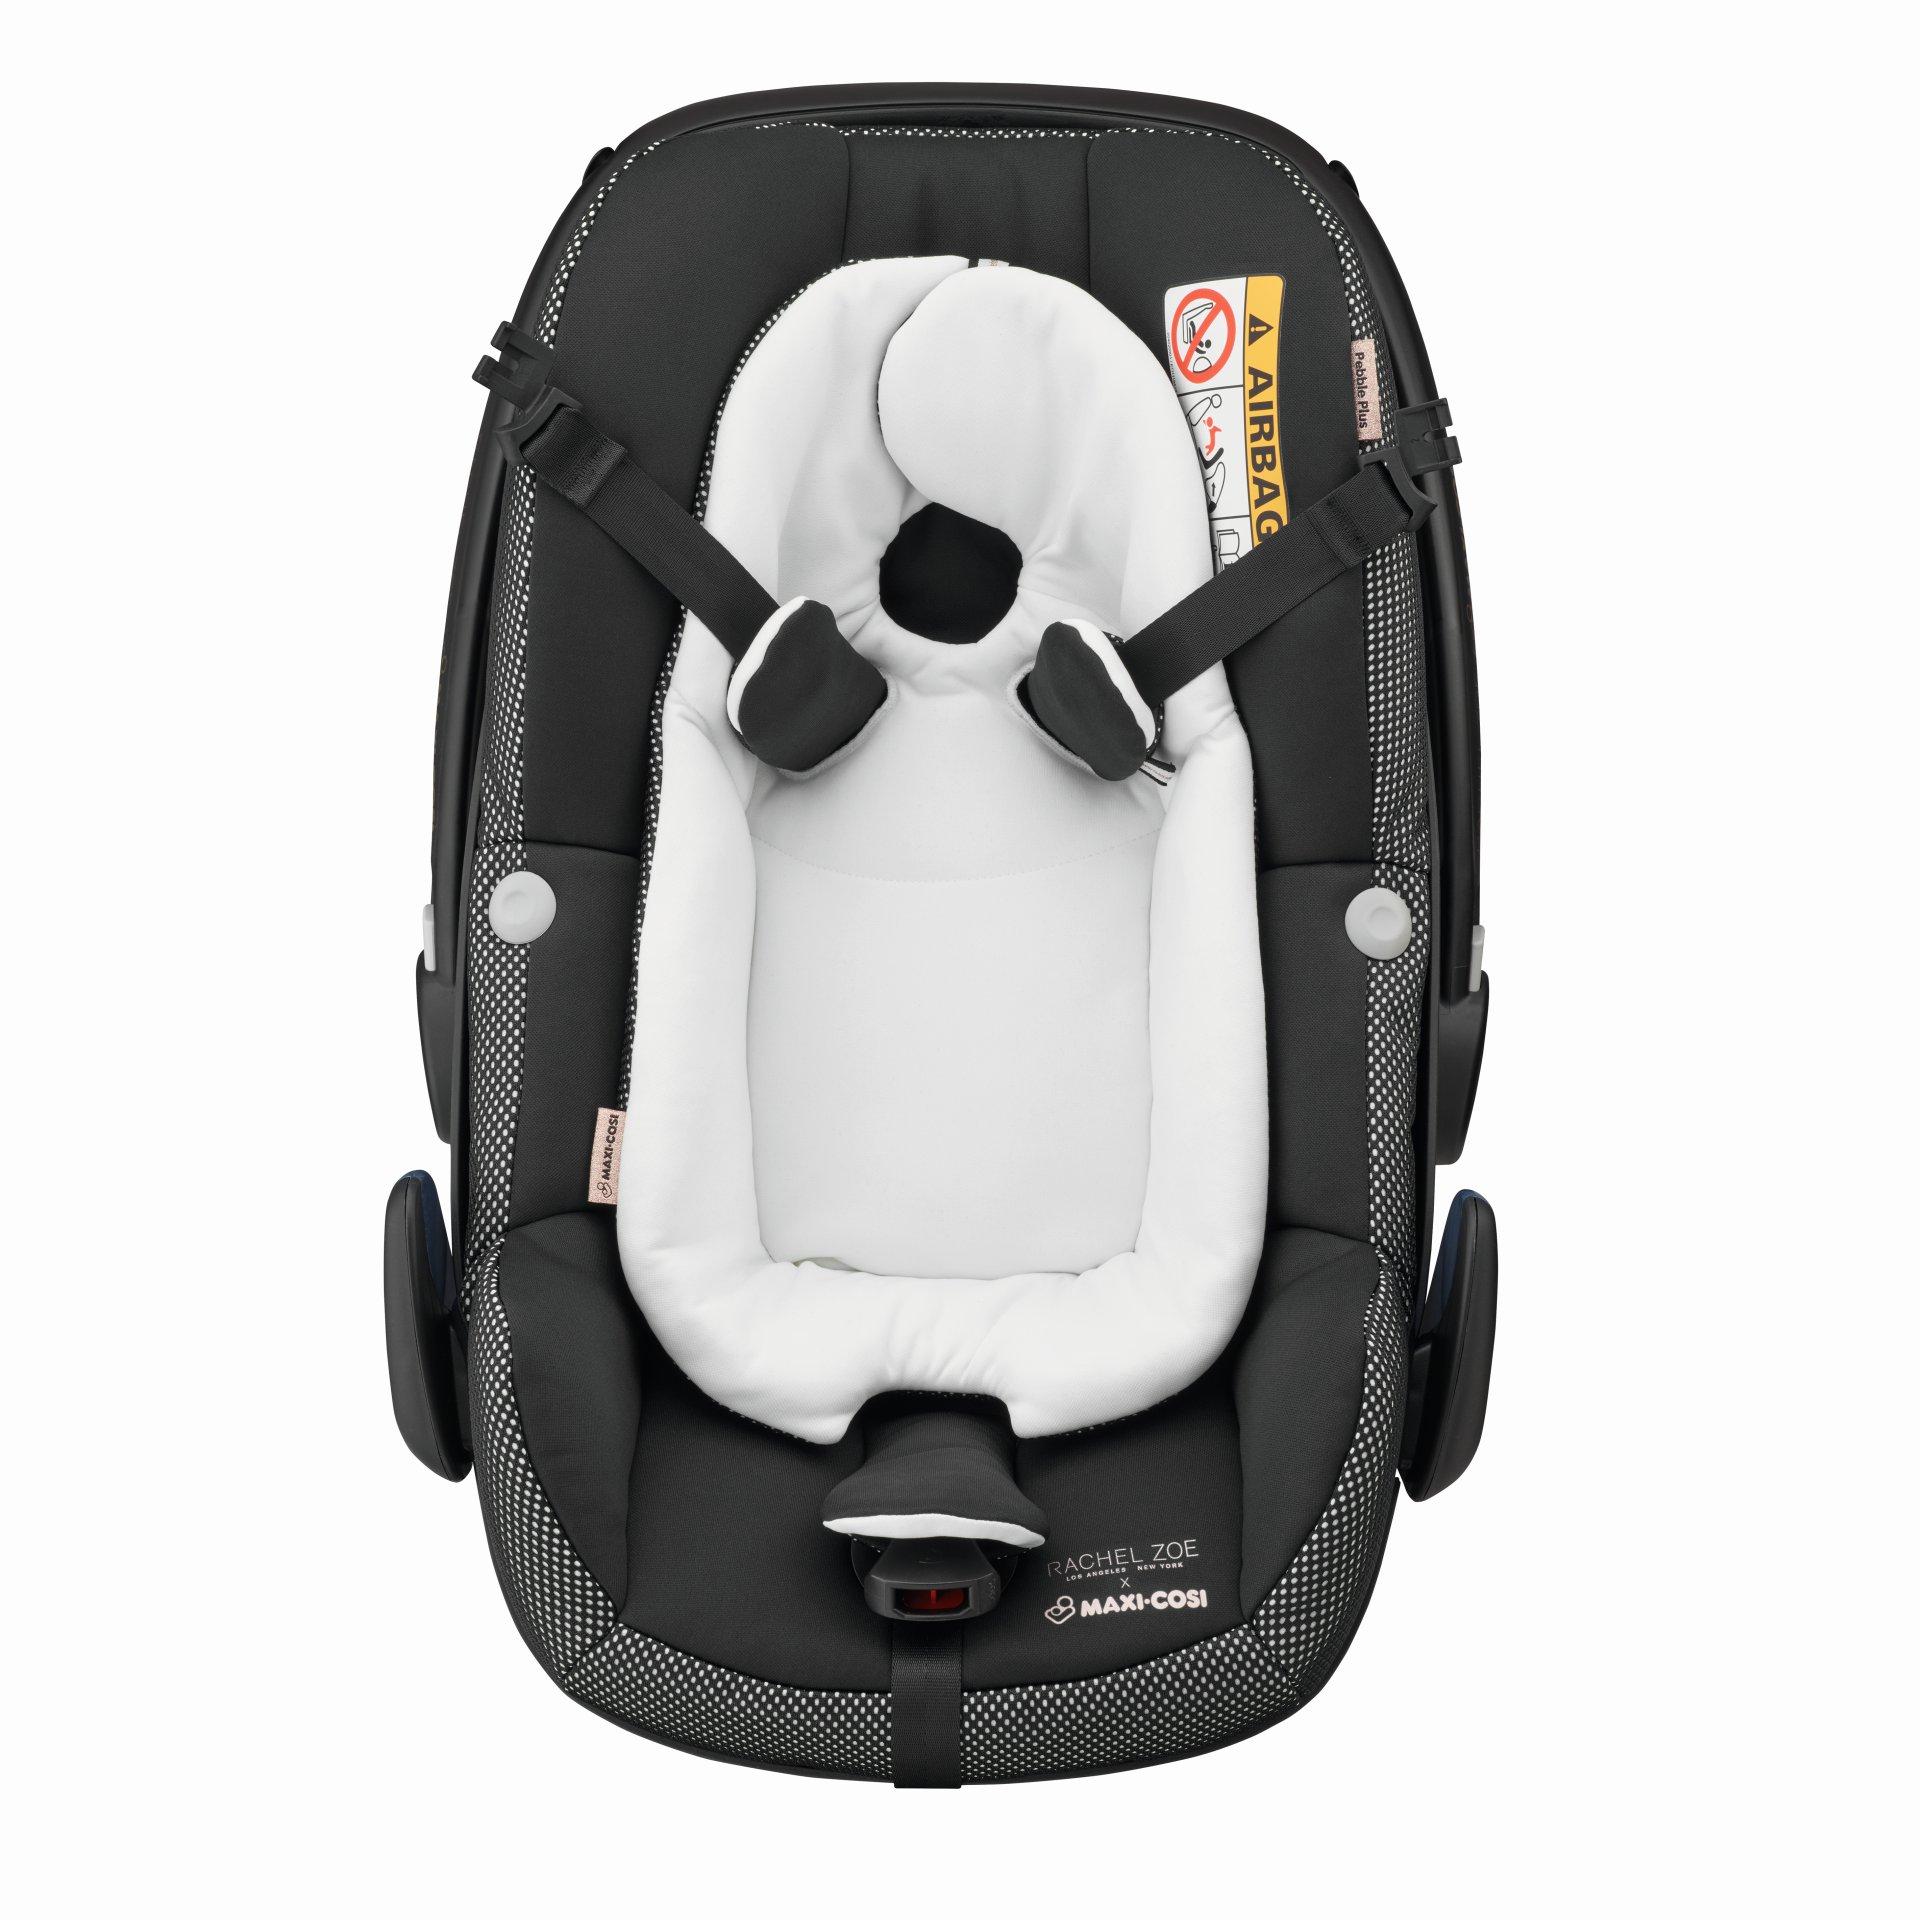 Maxi Cosi Infant Car Seat Pebble Plus Rachel Zoe Luxe Sport Collection 2019